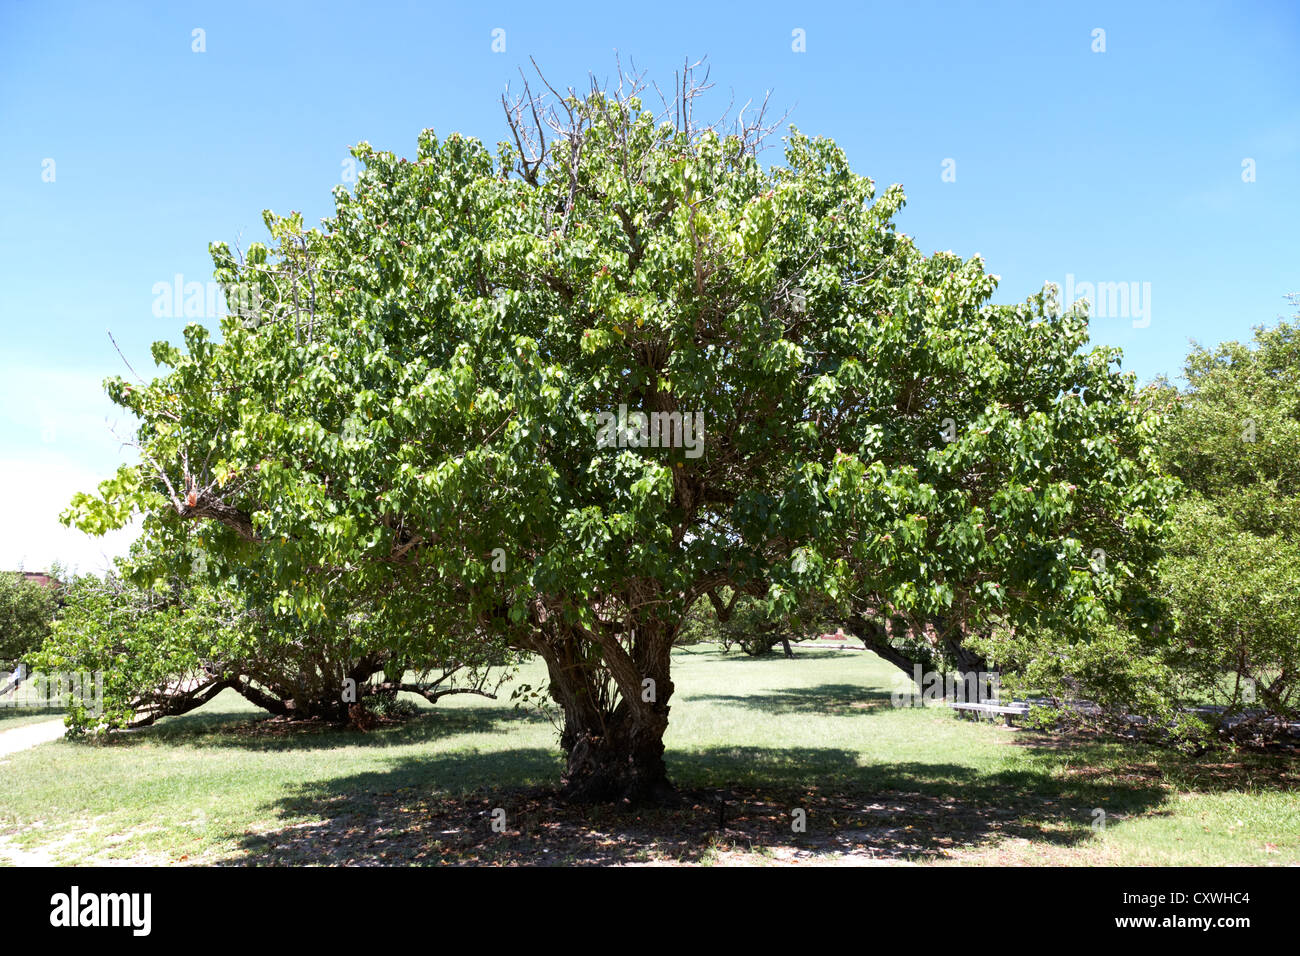 seaside mahoe or portia tree dry tortugas florida keys usa - Stock Image